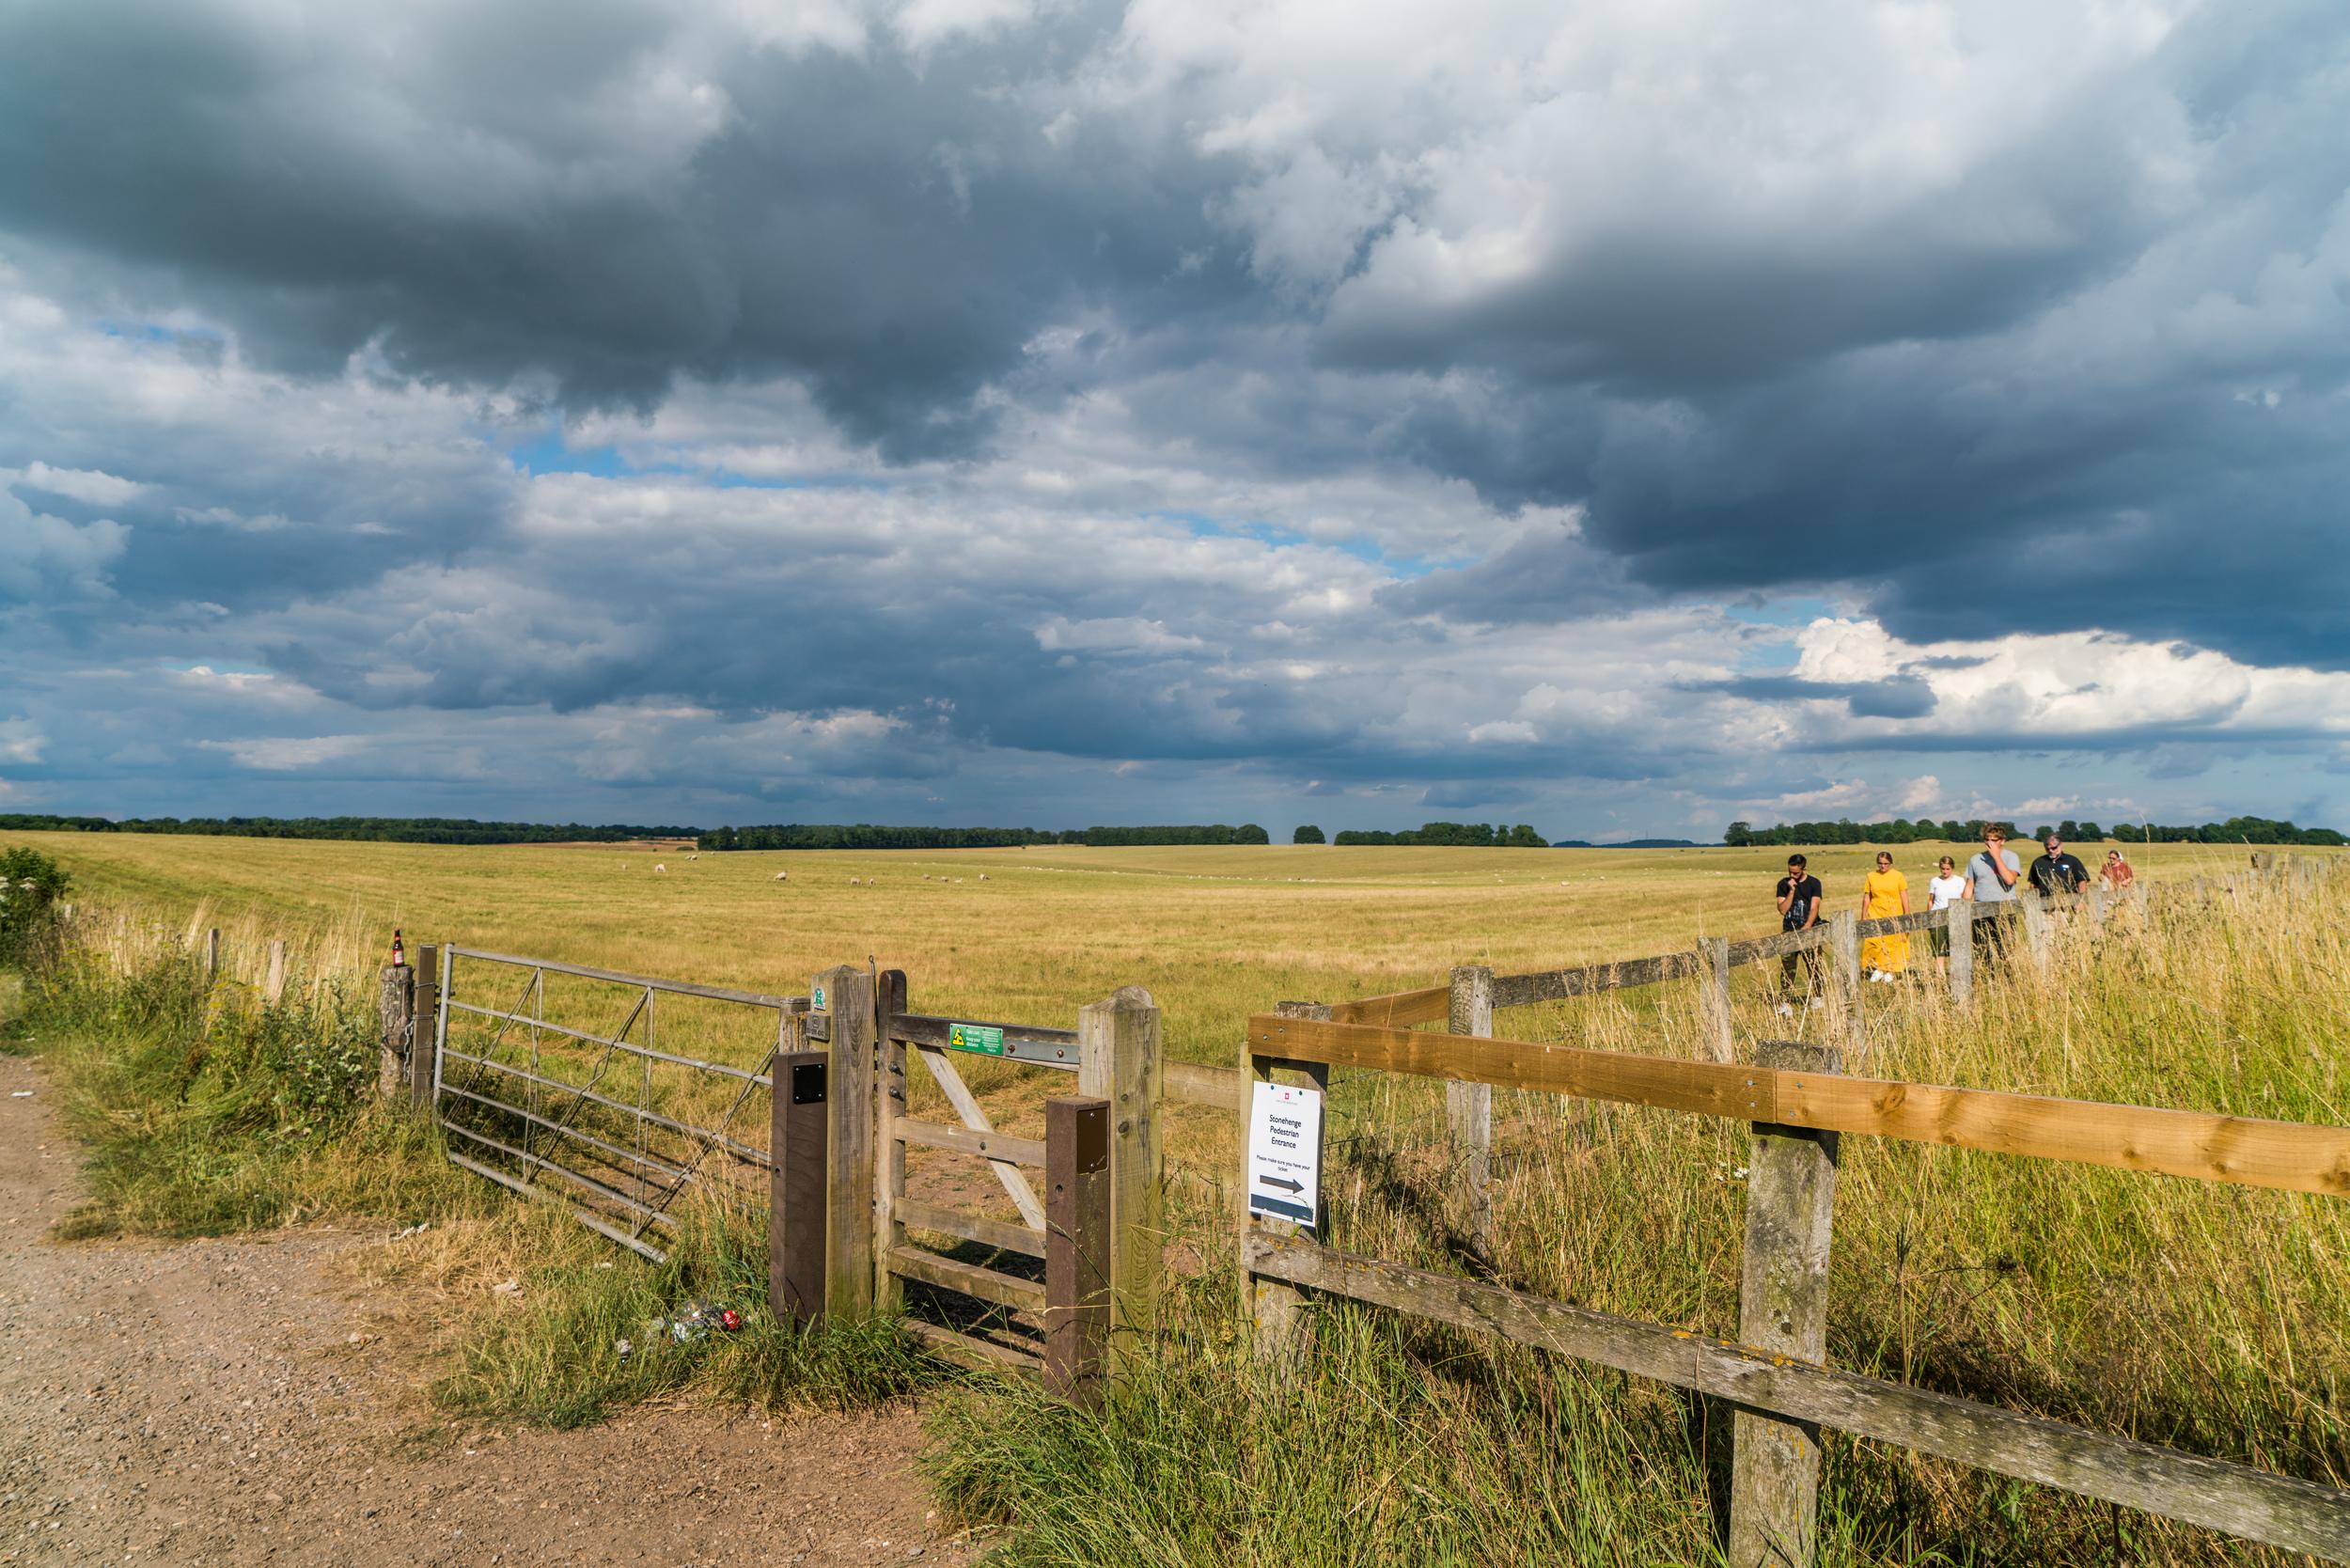 The farmer's gate